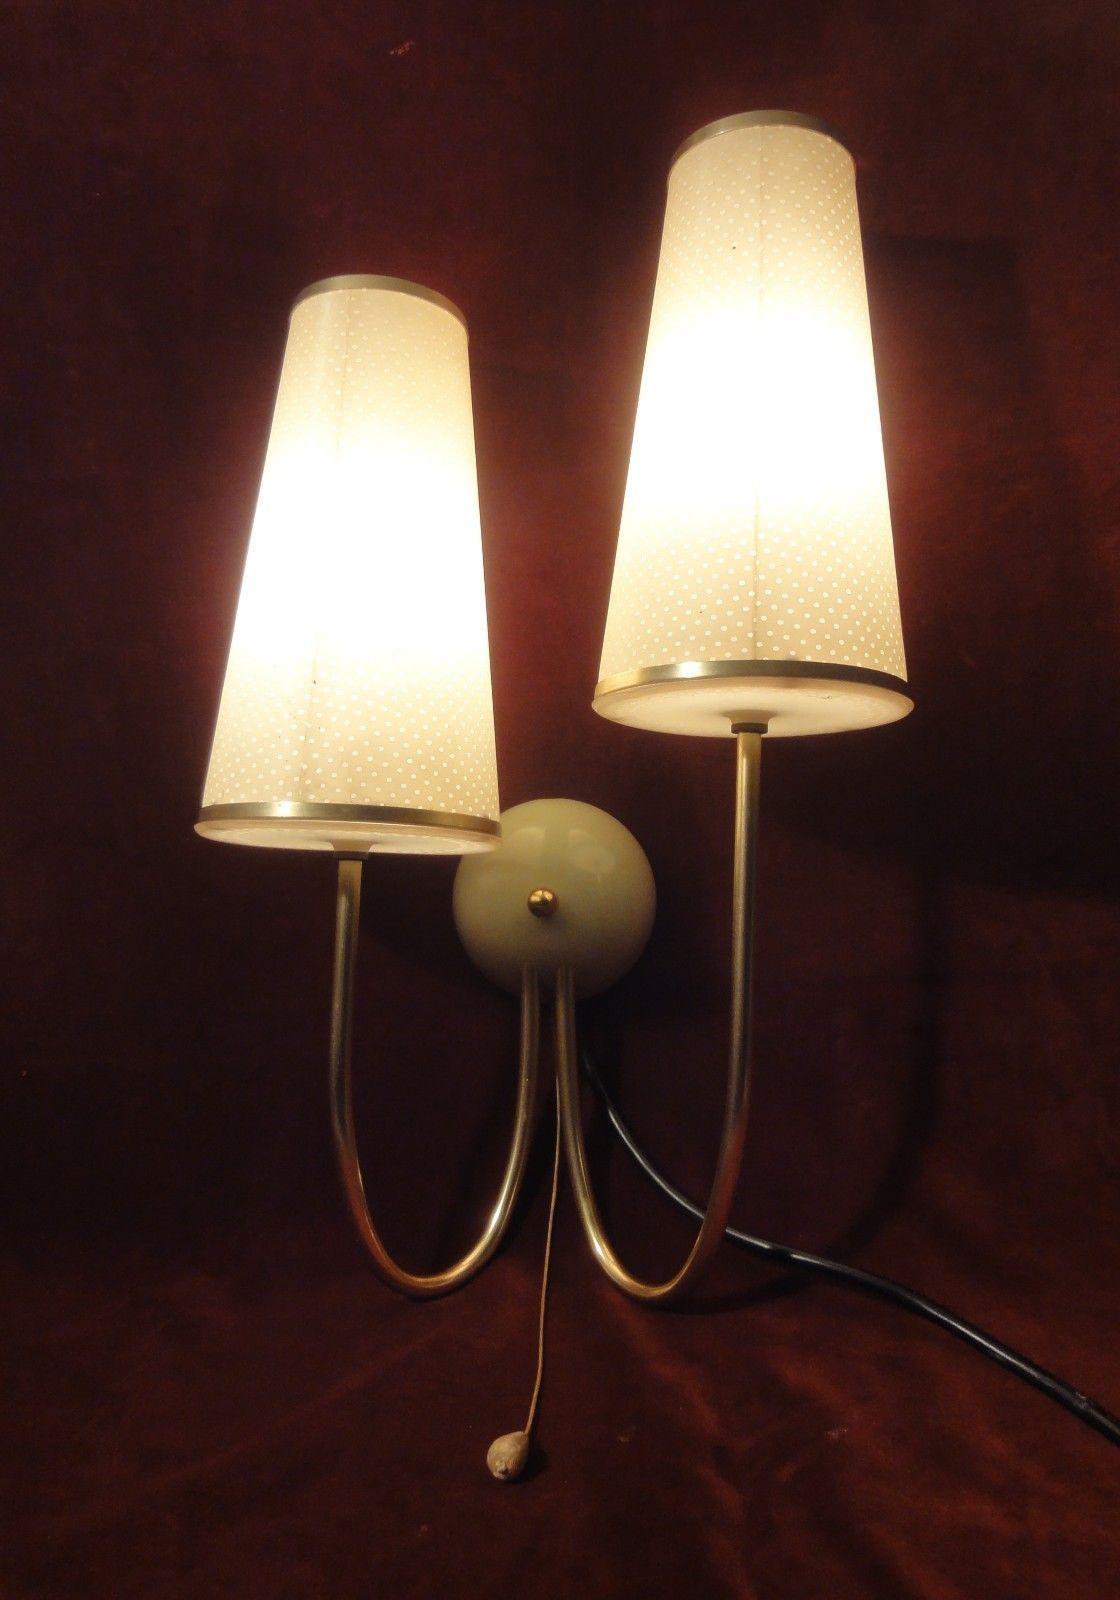 Wandlampe 50er 60er Marke Erco Selten Topzustand Ebay Wandlampe Lampen Wande